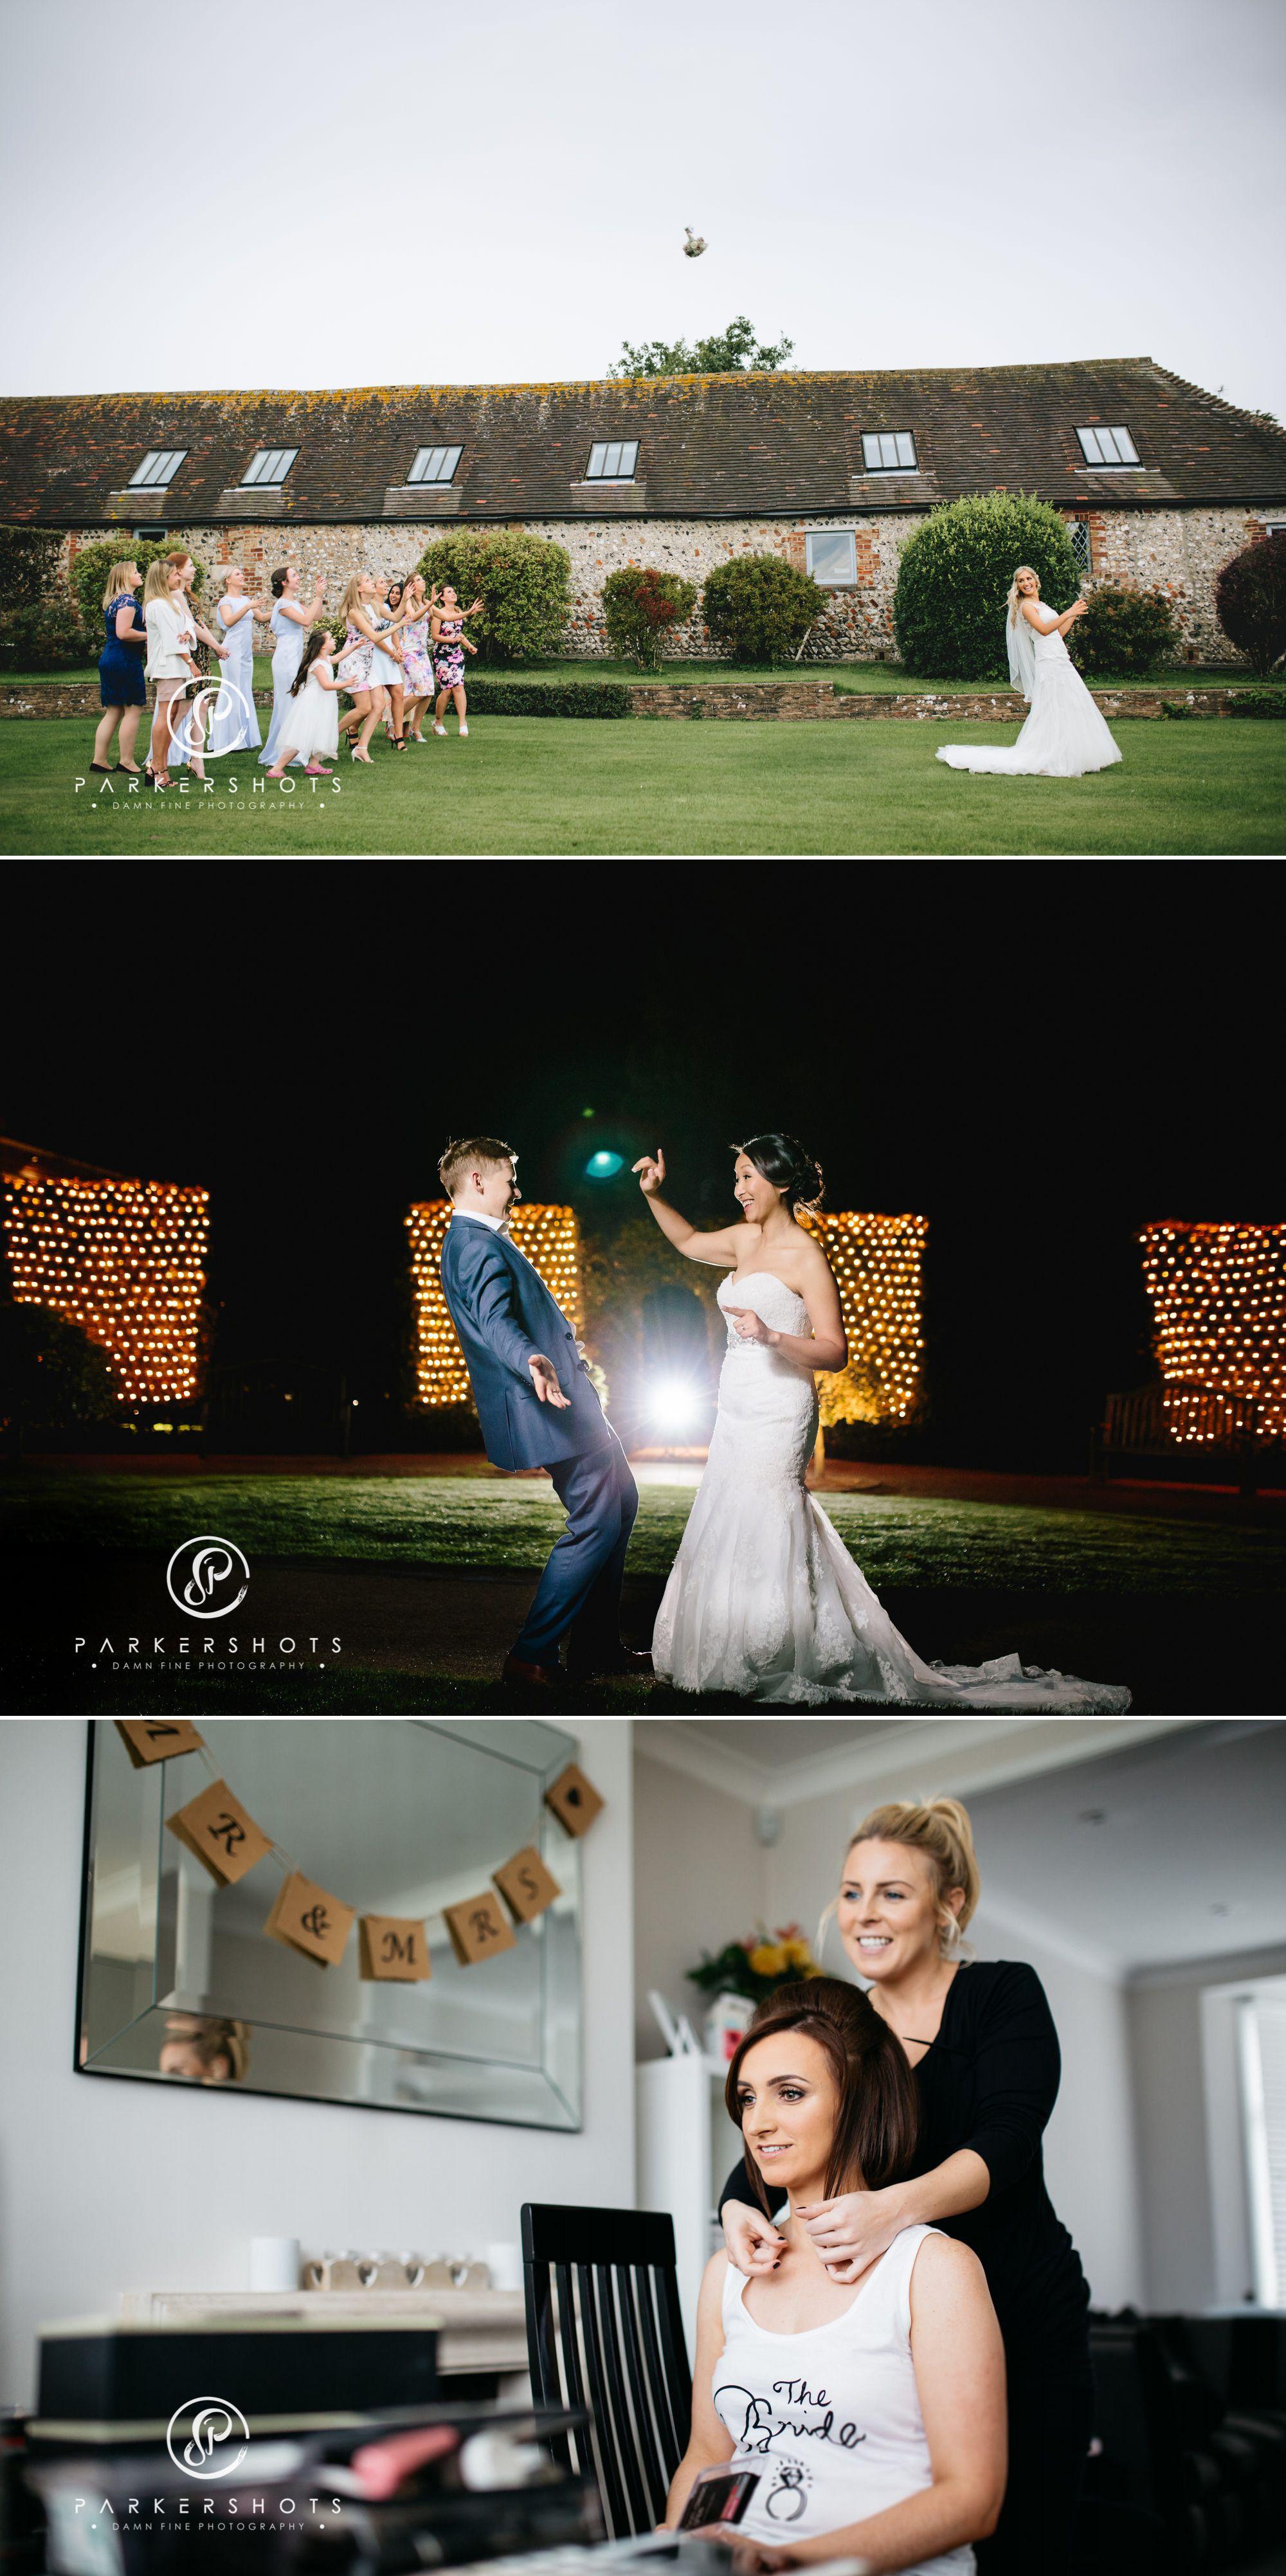 Best_Of_Wedding_Photographer_2015 17